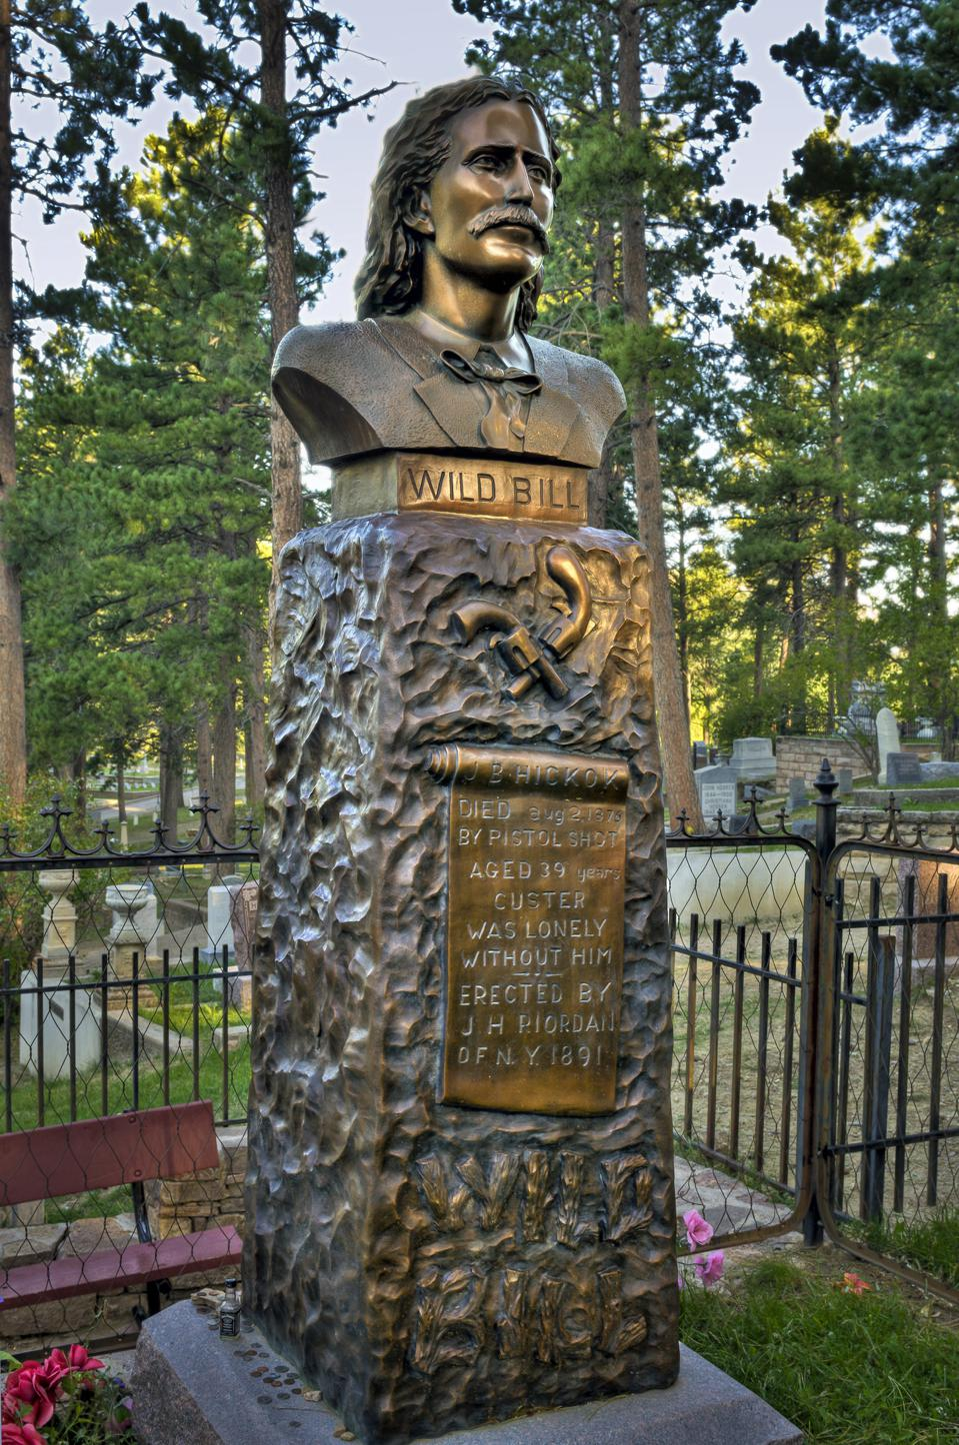 Bust of Wild Bill Hickok, Mount Moriah Cemetery